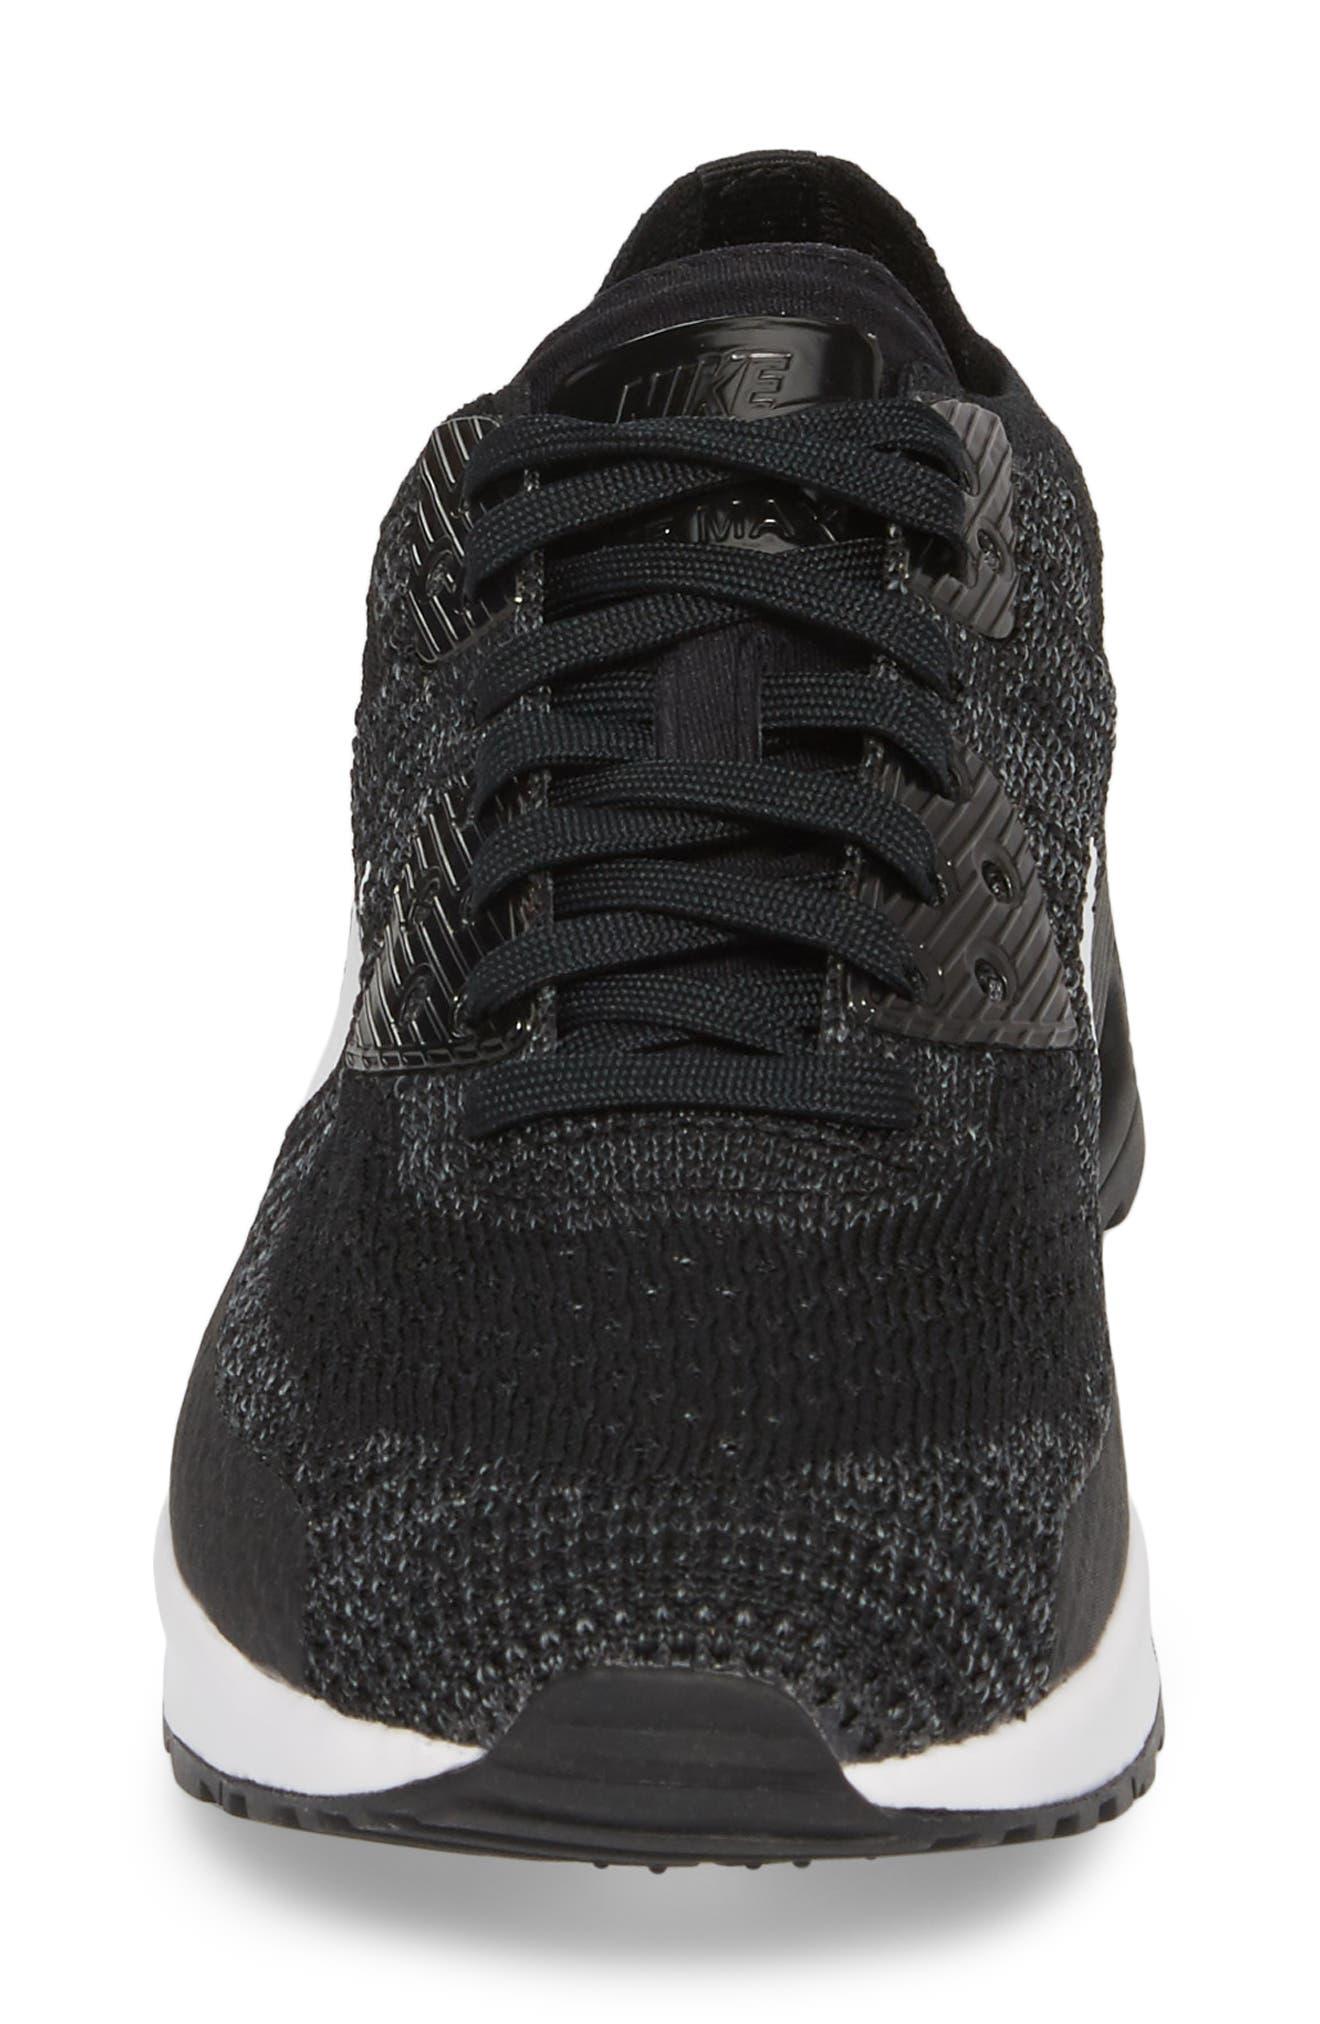 NIKE,                             Air Max 90 Flyknit Ultra 2.0 Sneaker,                             Alternate thumbnail 4, color,                             004